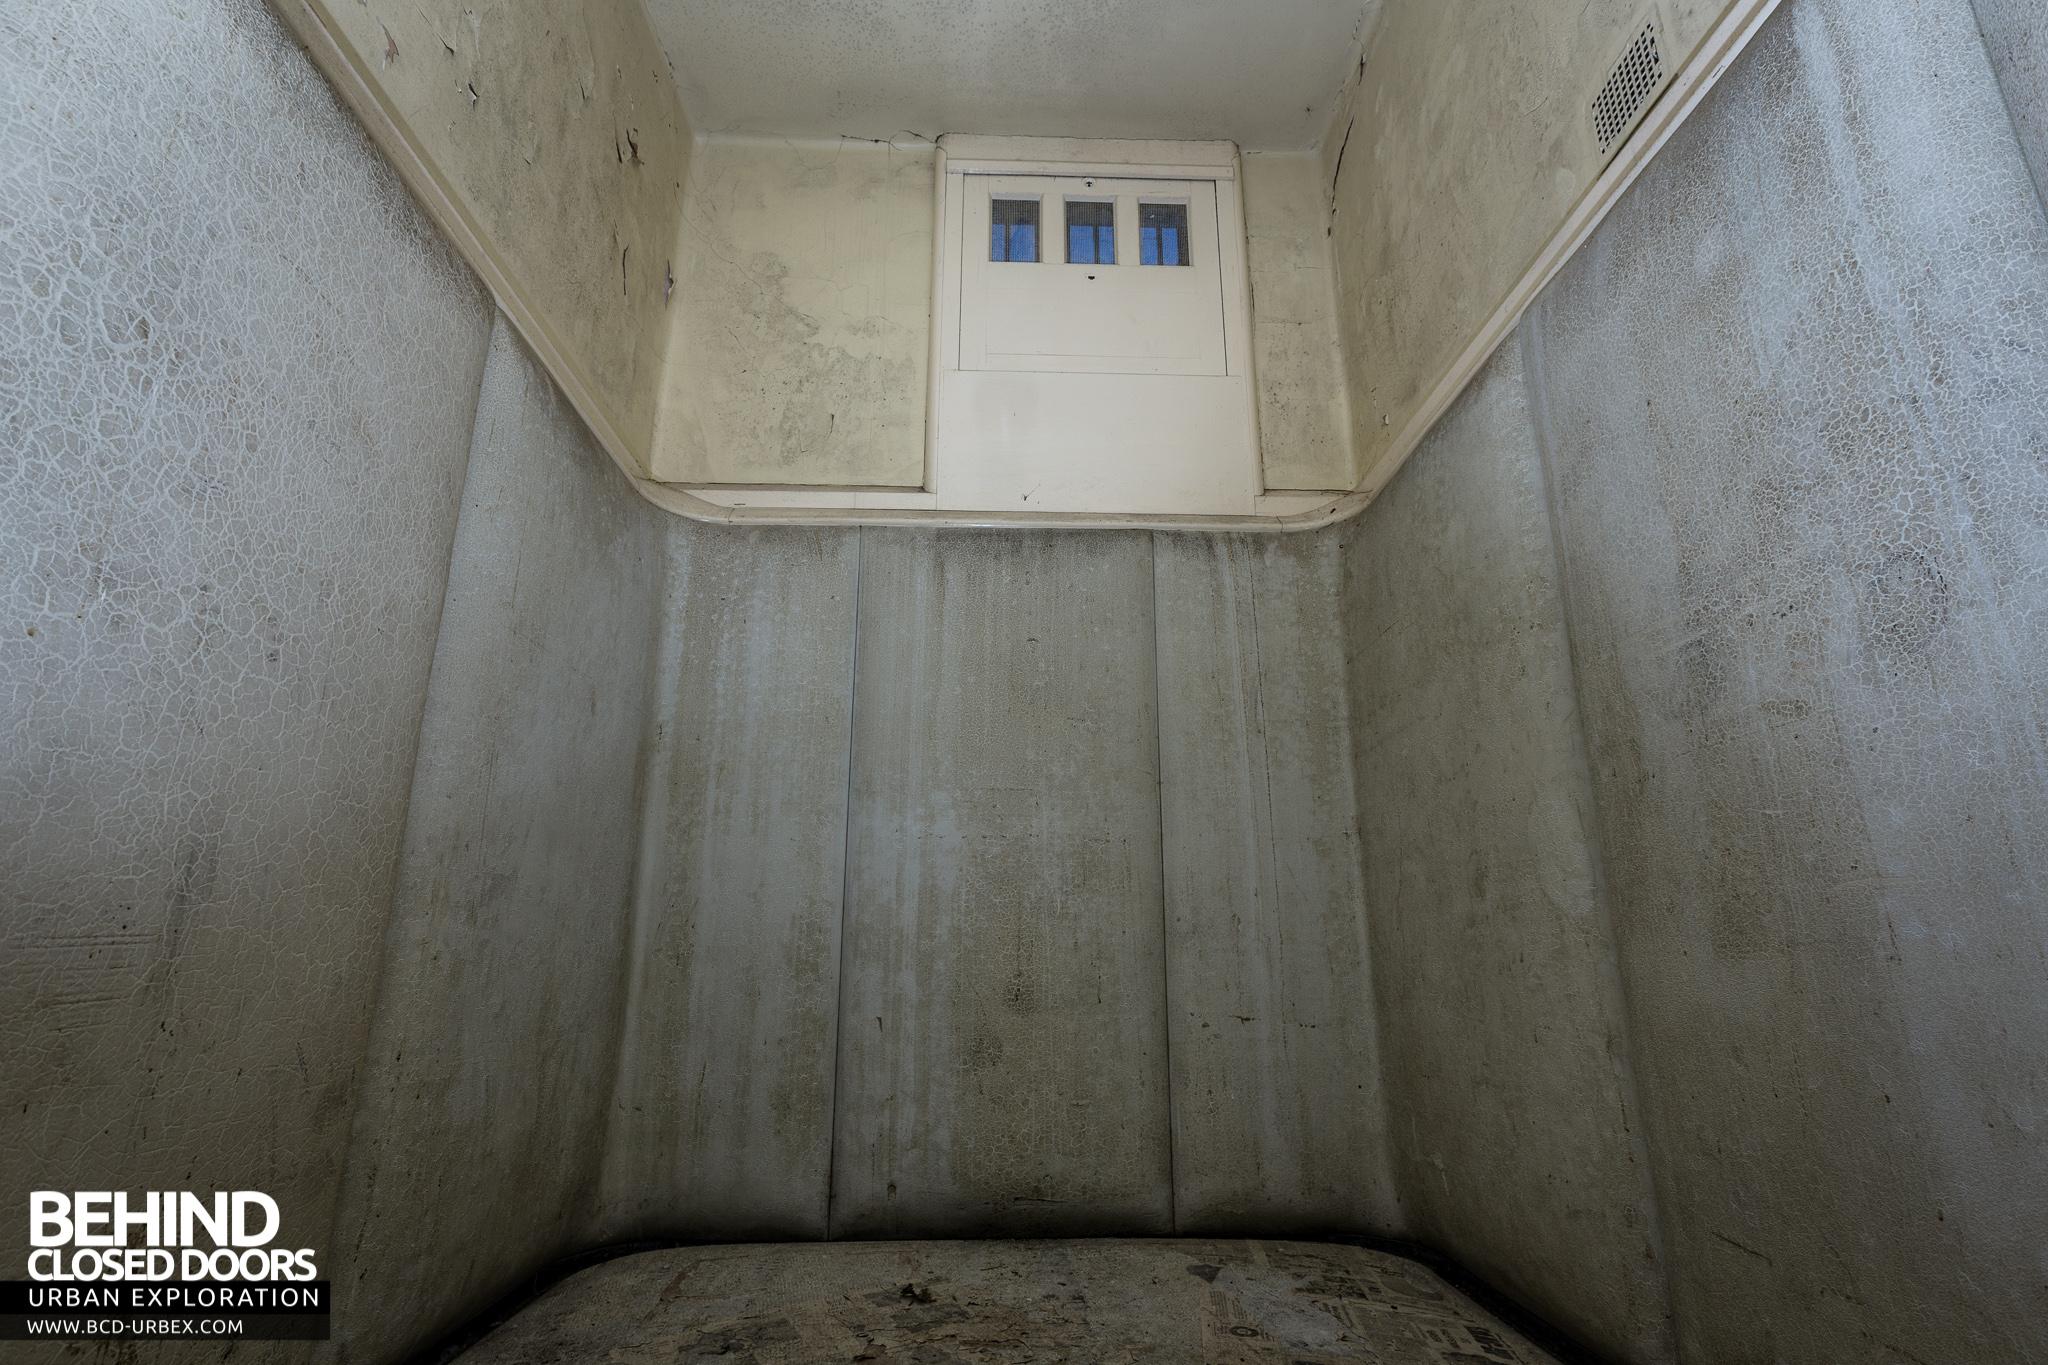 Padded Cell Royal Hospital Haslar G Block Gosport Uk